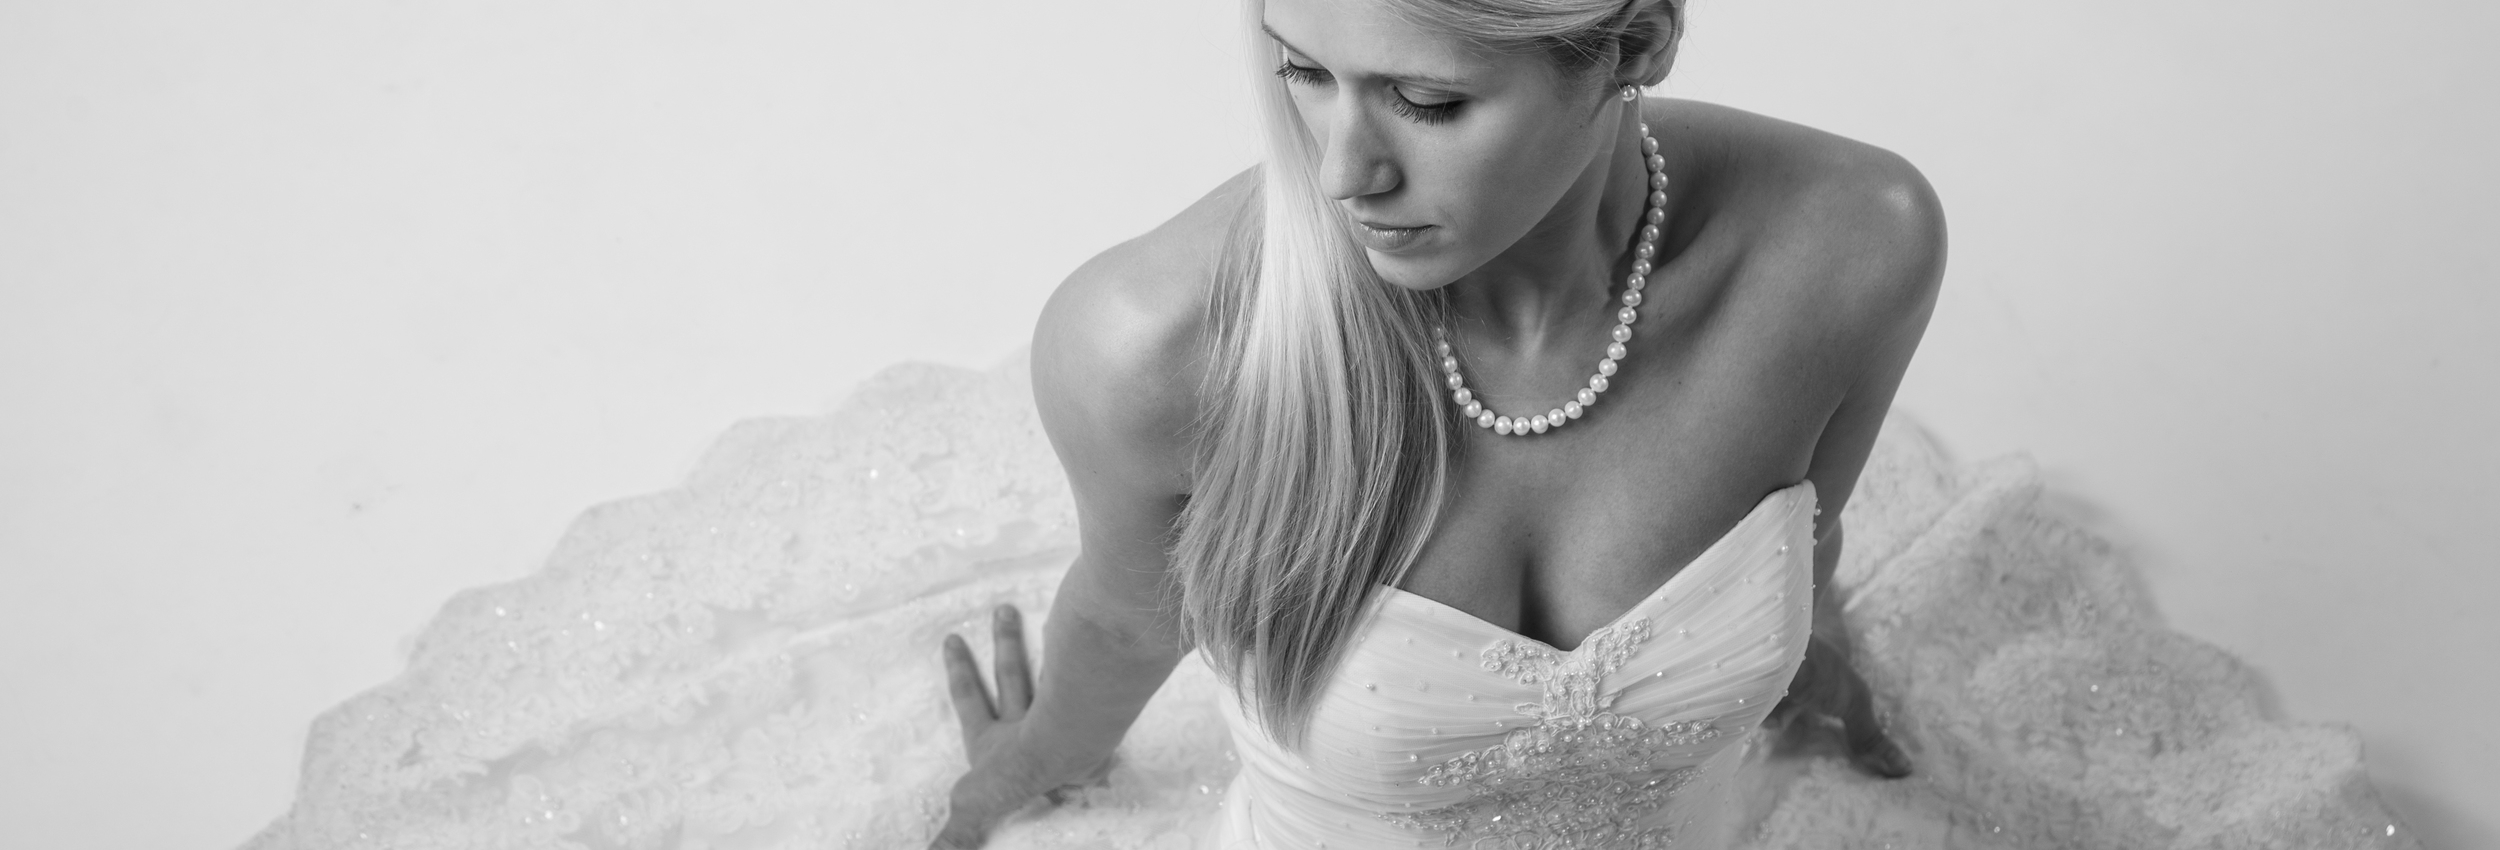 Bridal_001.jpg